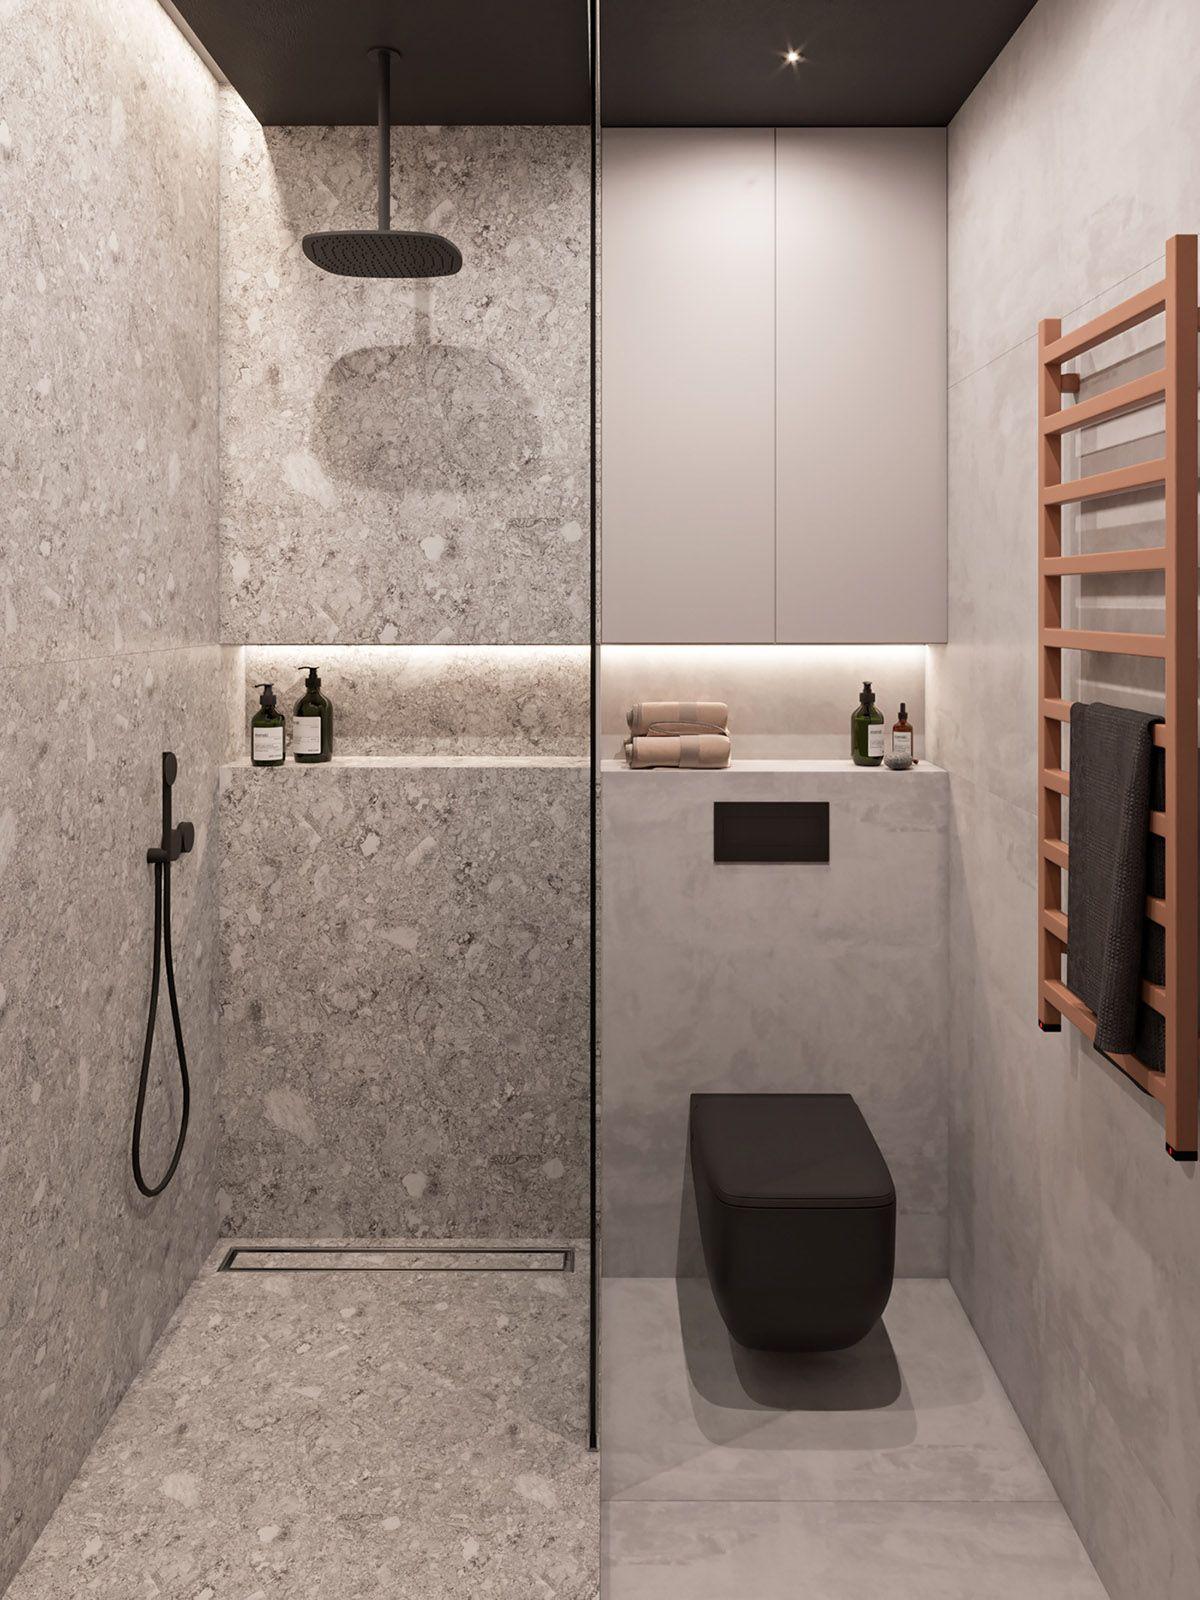 21-Penthouse Interior Design With Orange Accents